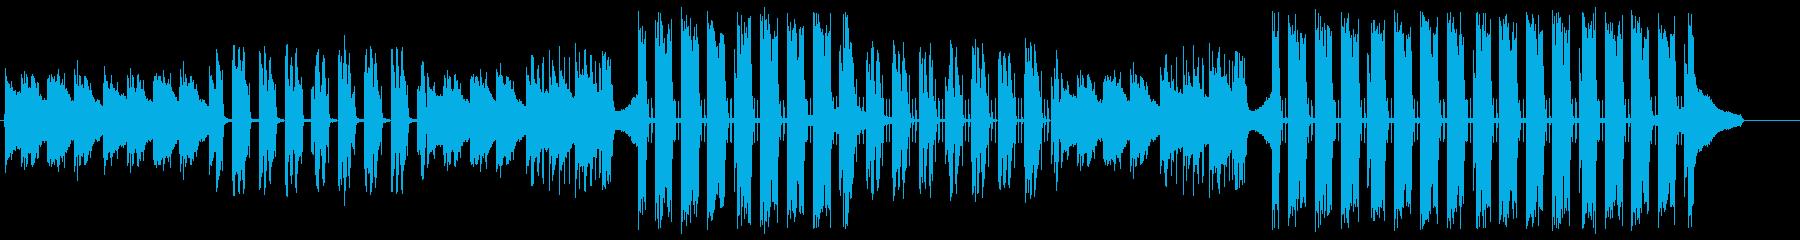 Future Pop 洋楽 メロウ の再生済みの波形